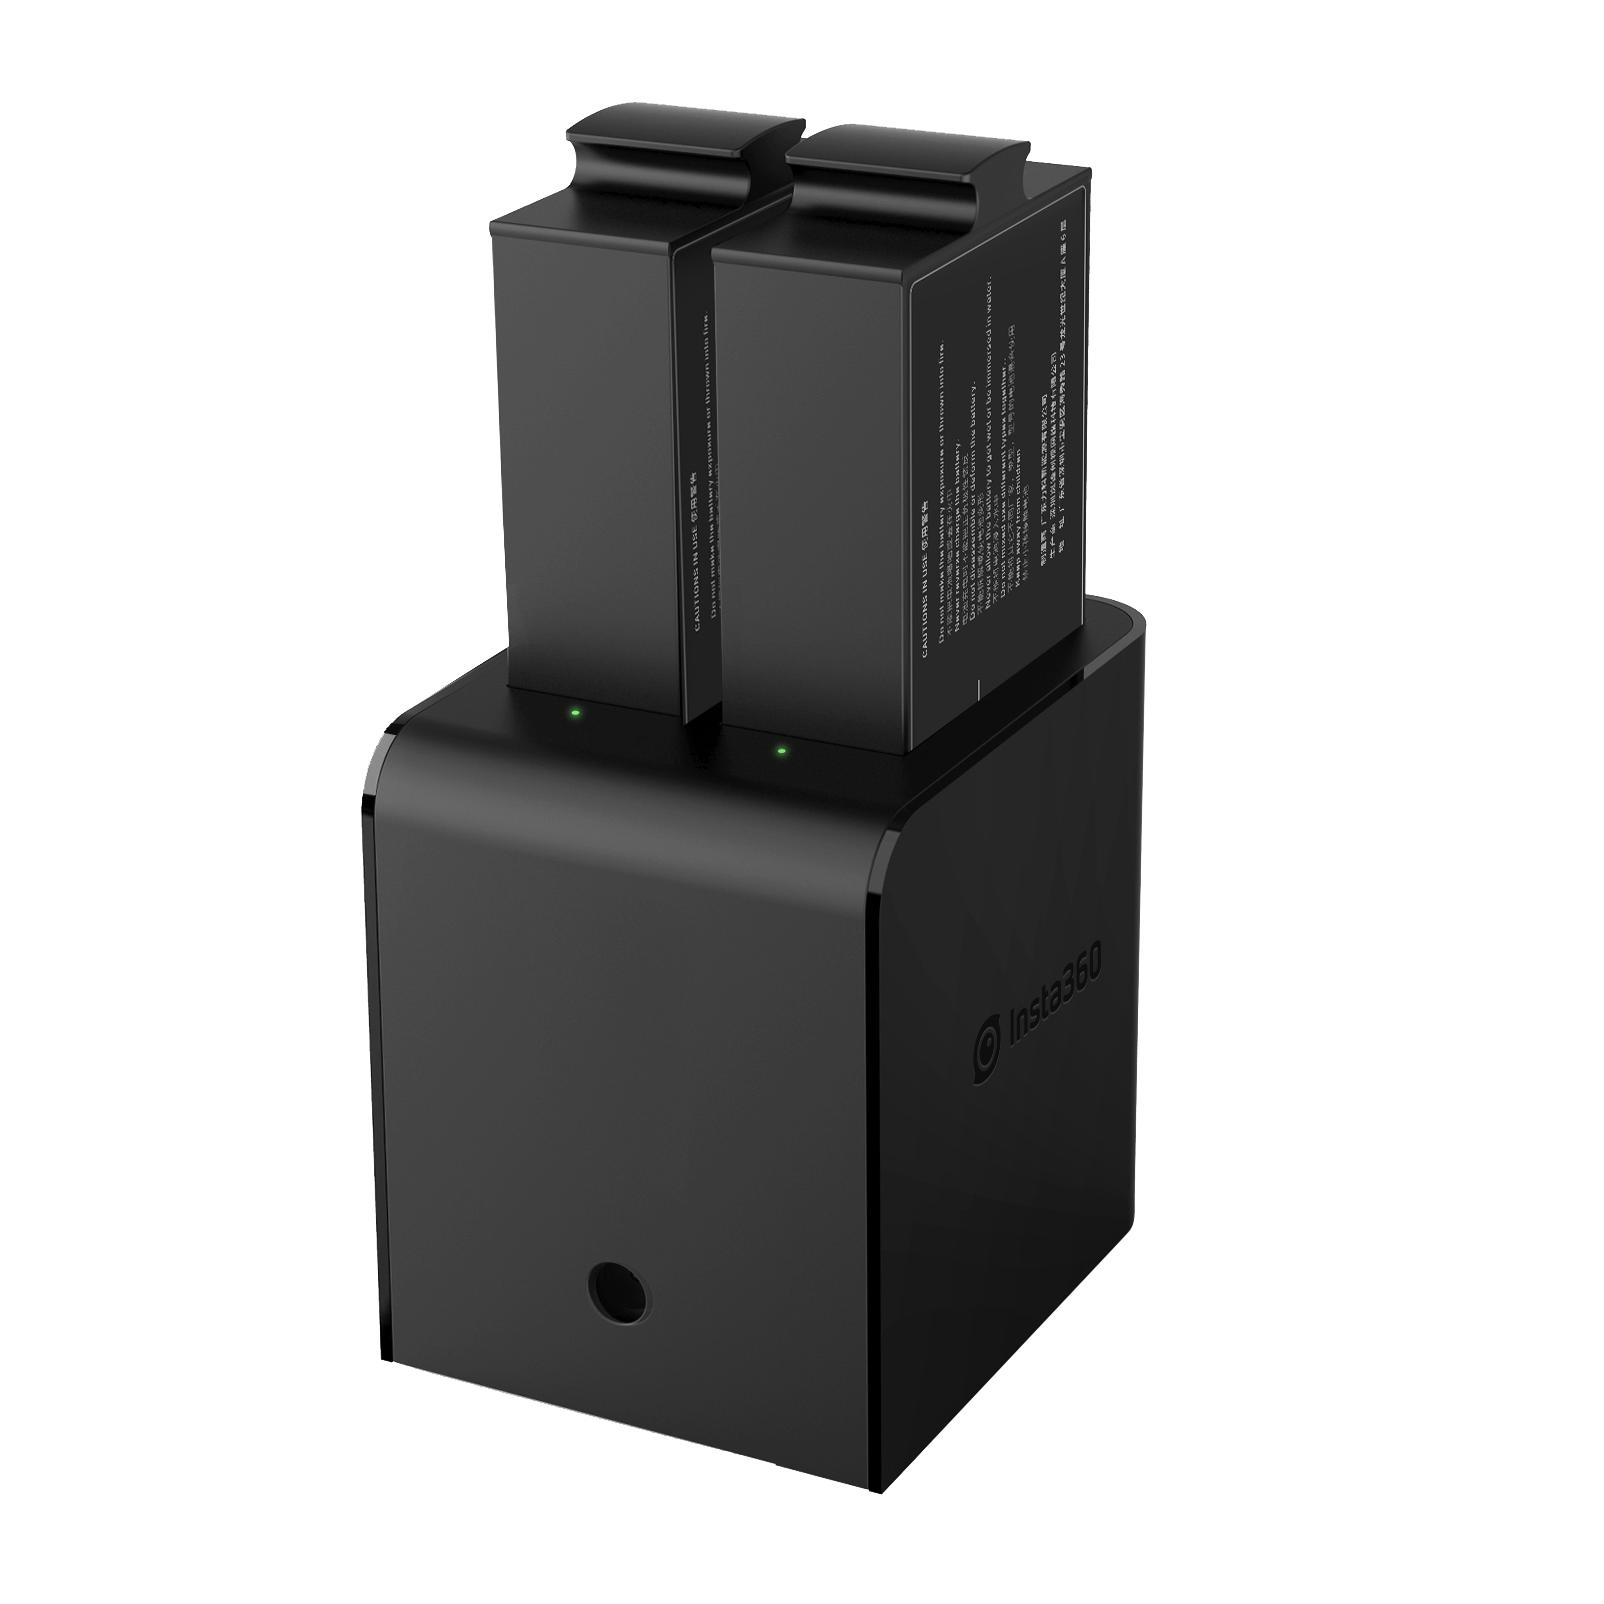 Insta360 charging station